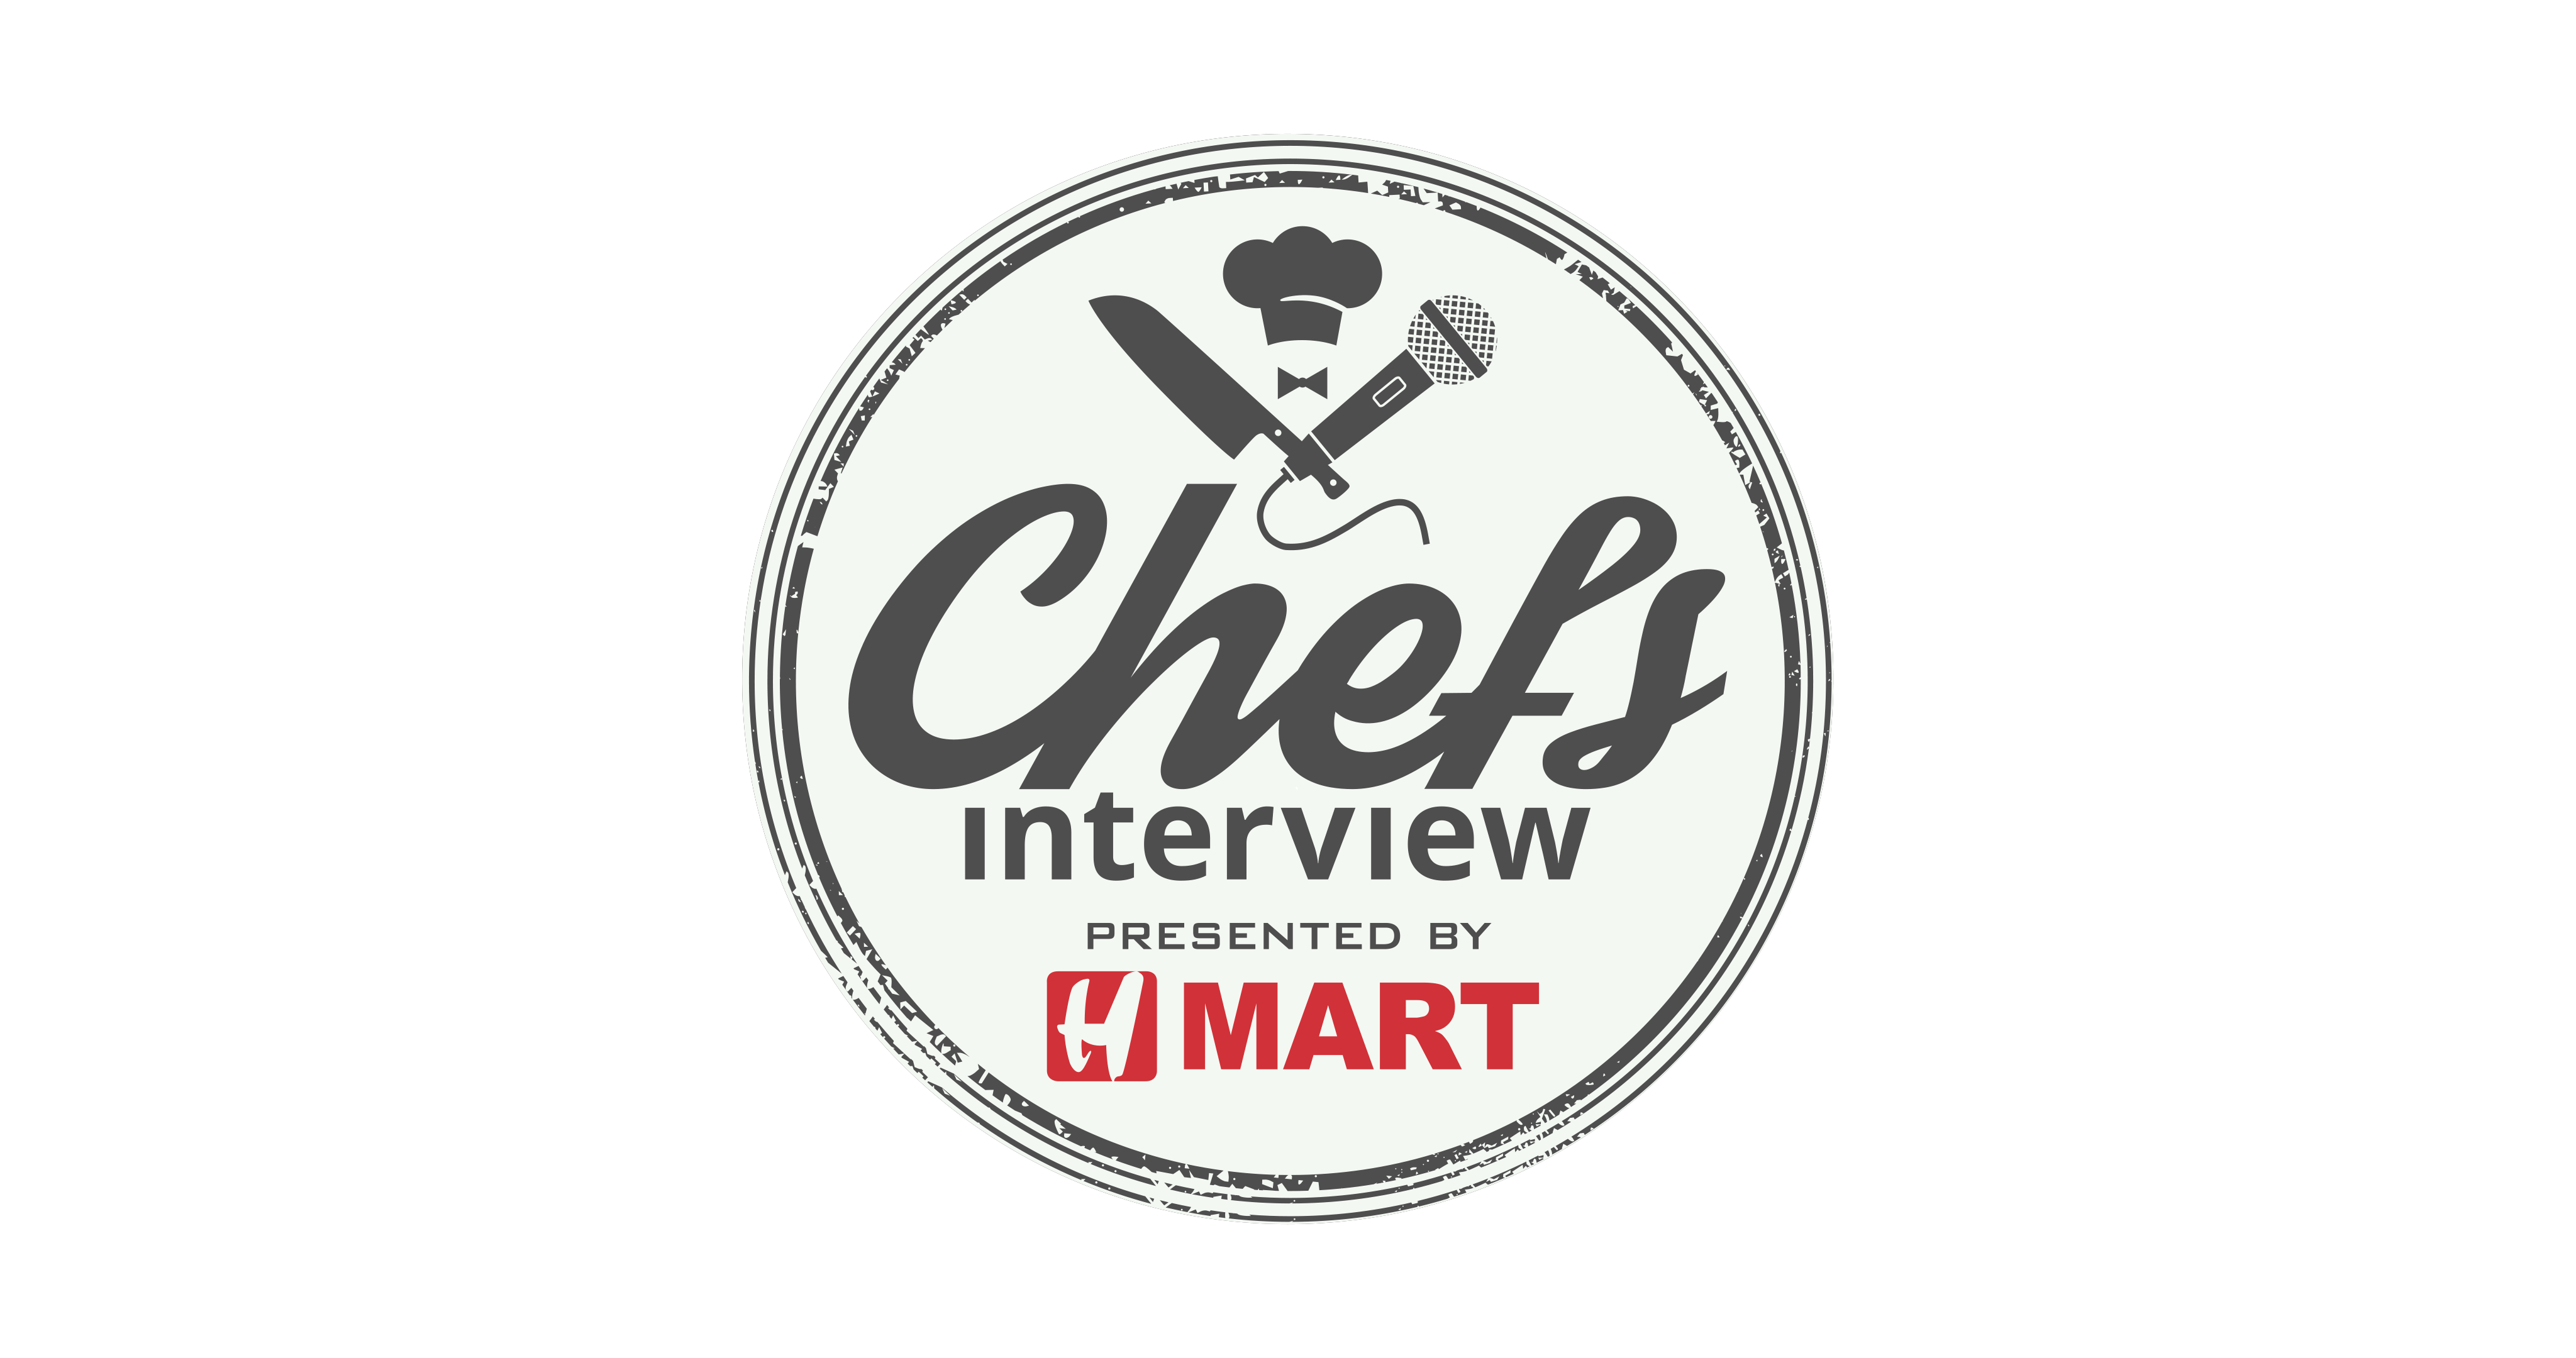 chef's interview logo